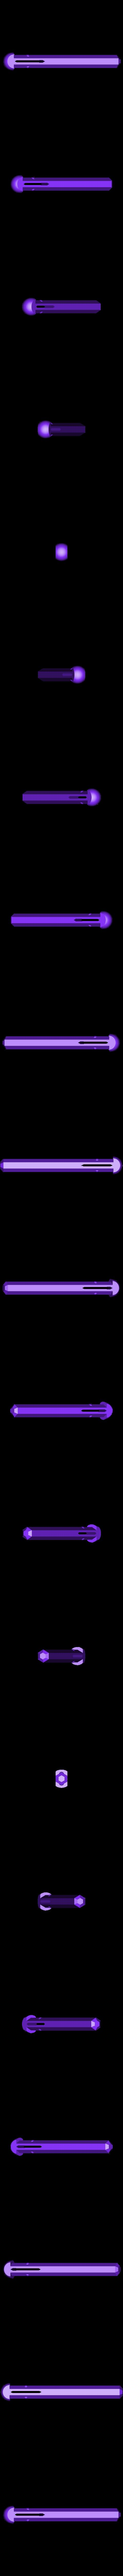 NOISEMAKER-HANDLE.stl Download free STL file Party Noisemaker • 3D printable object, WorksBySolo